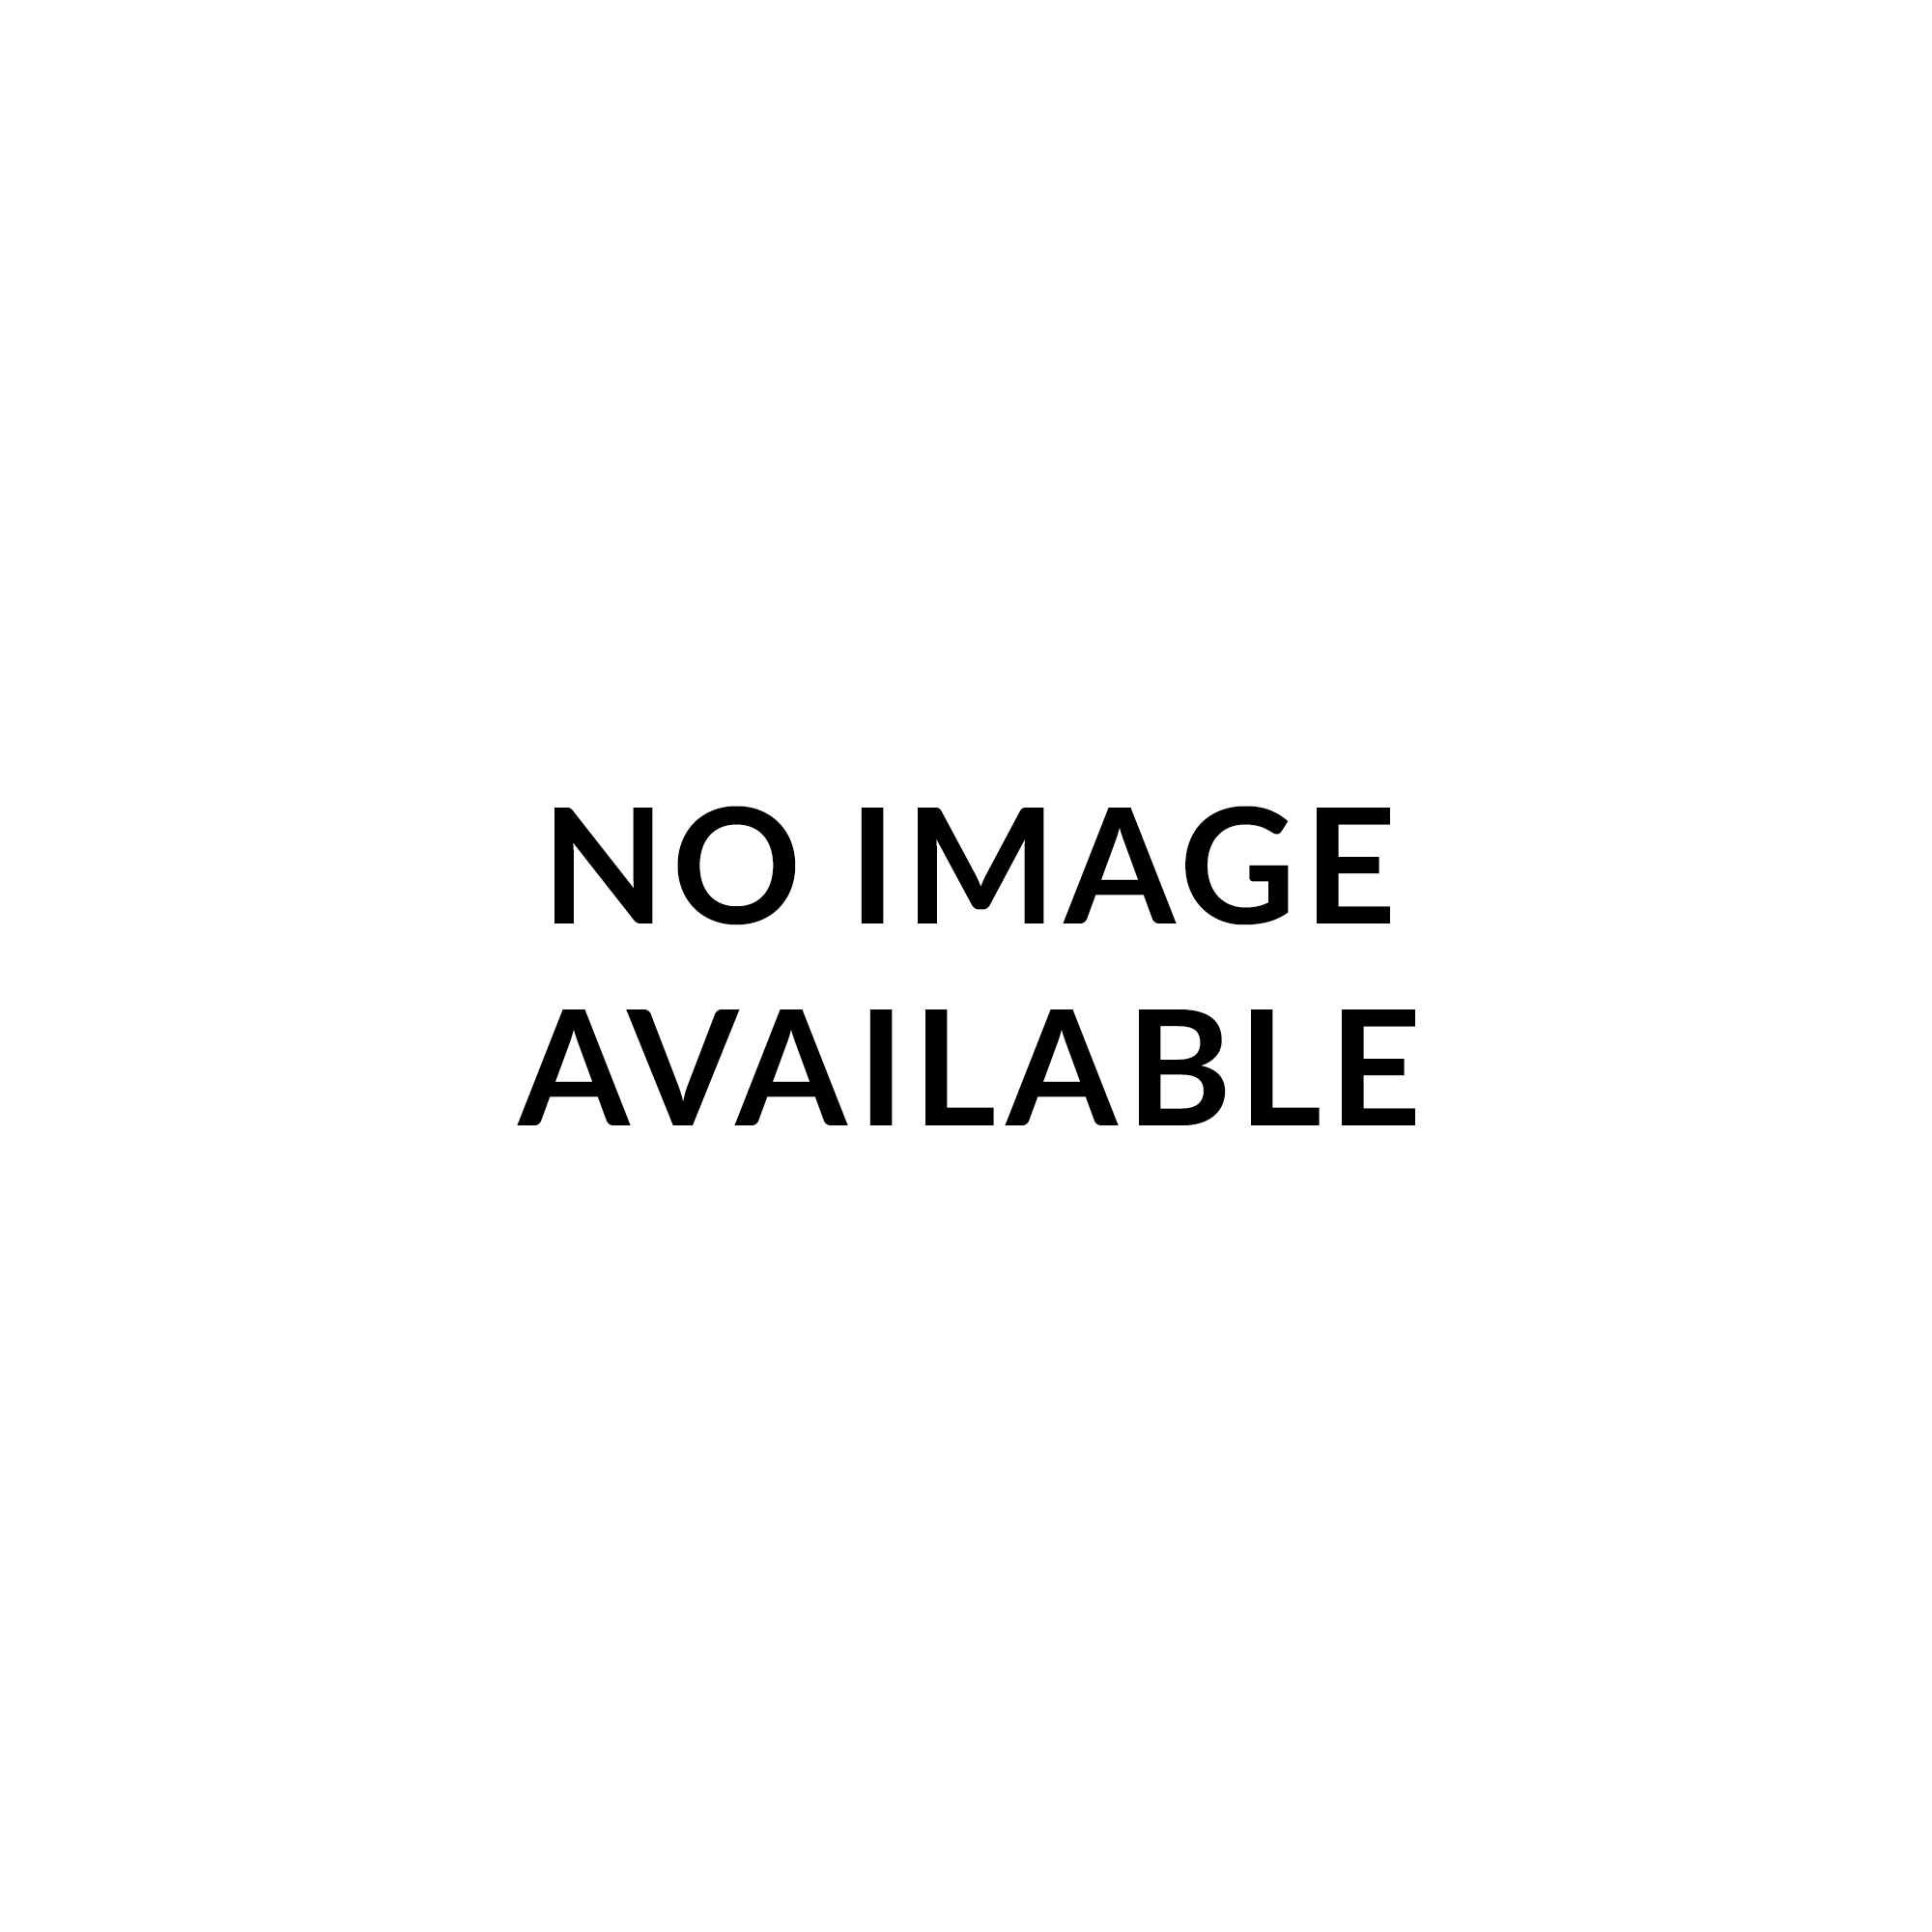 Jim Dunlop 926 LAP DAWG TONEBAR, Chromed Brass, 5.1oz